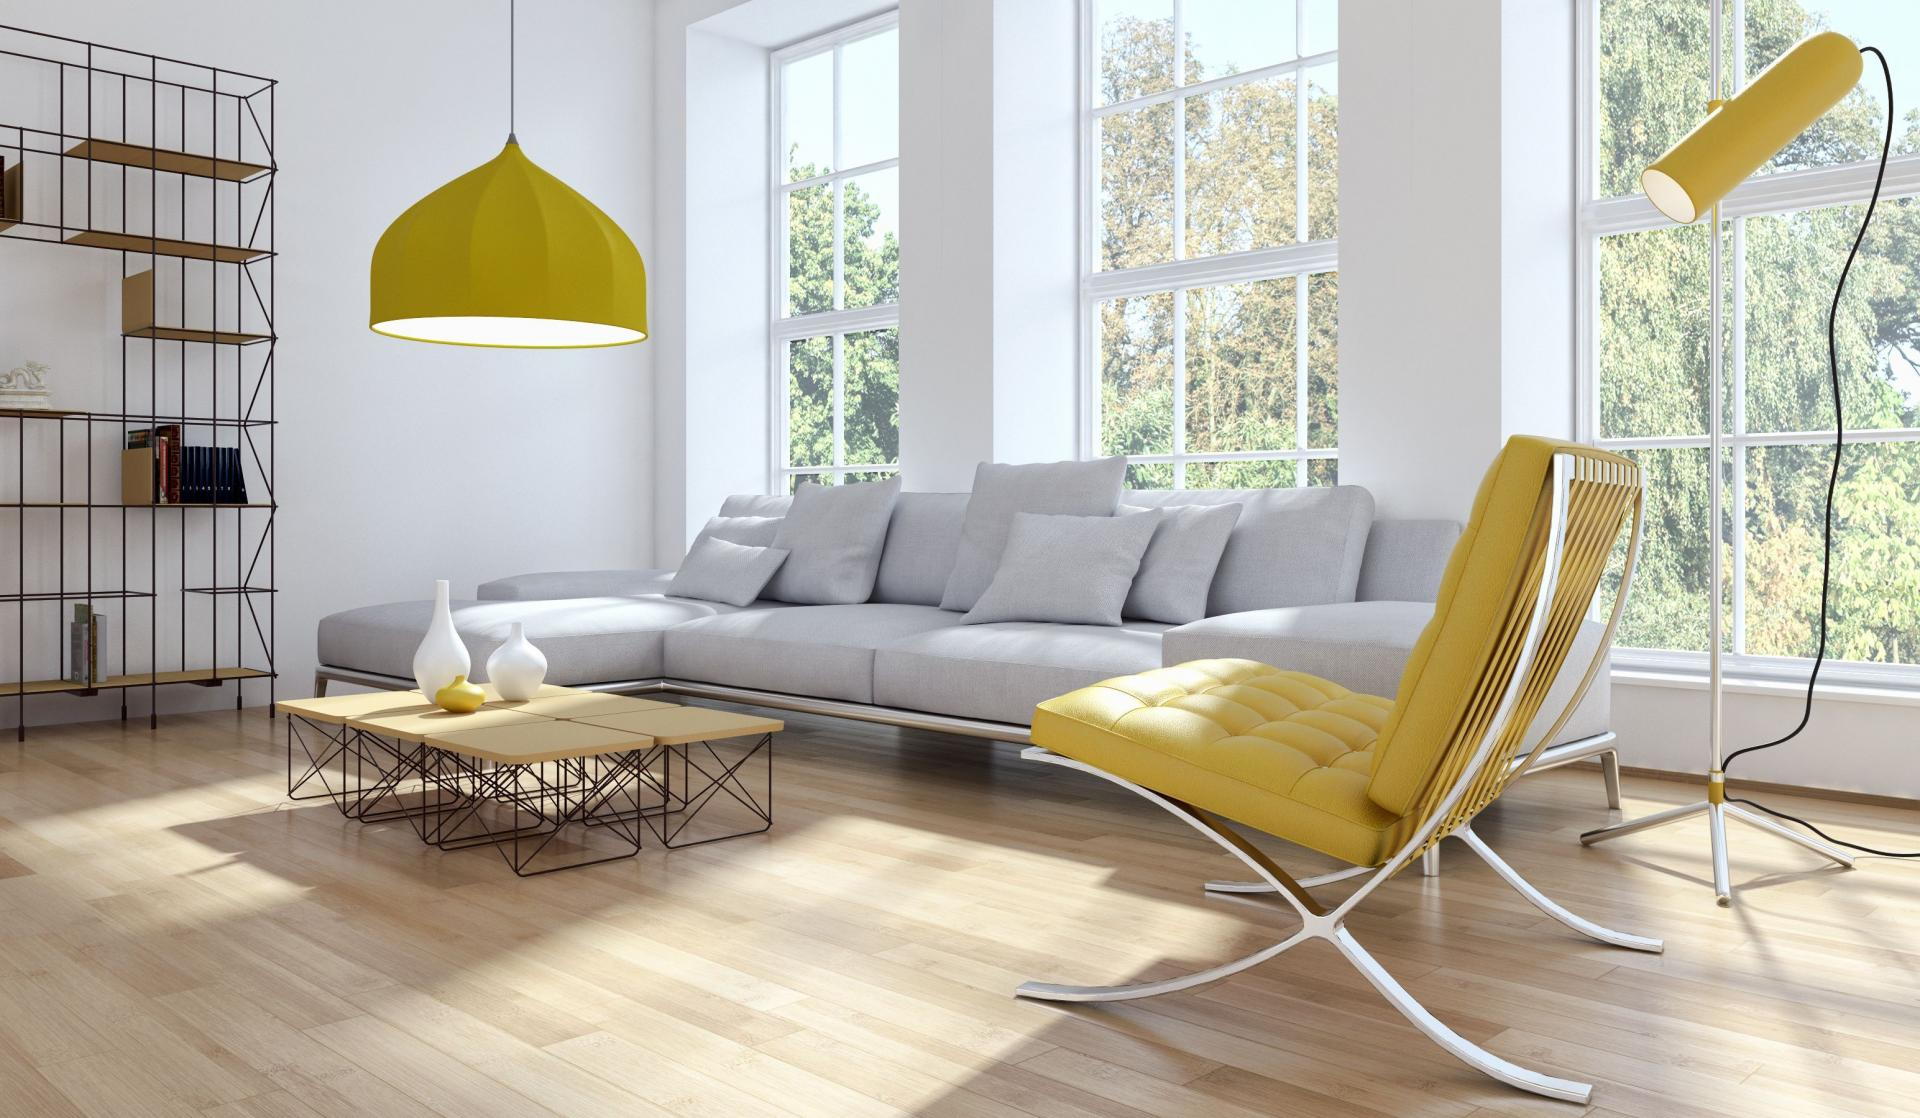 17 hot interior design trends for summer 2016